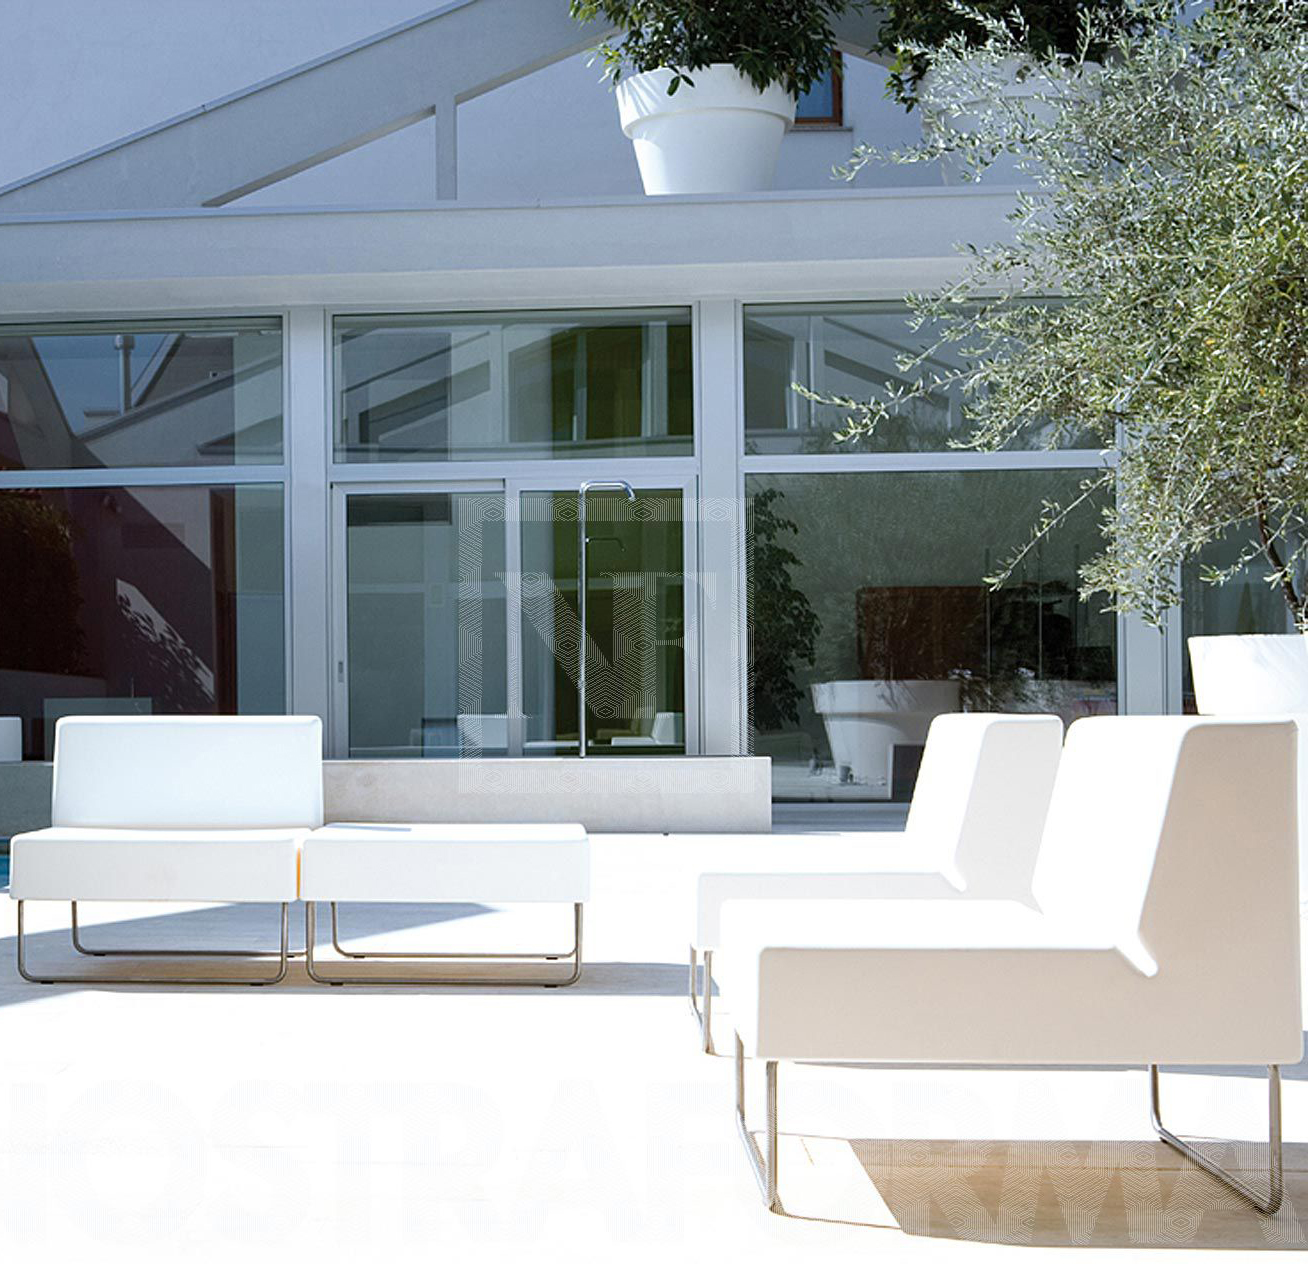 Arredamento bar esterno set tavolo sedie marrone poly for Arredamento da esterno per bar